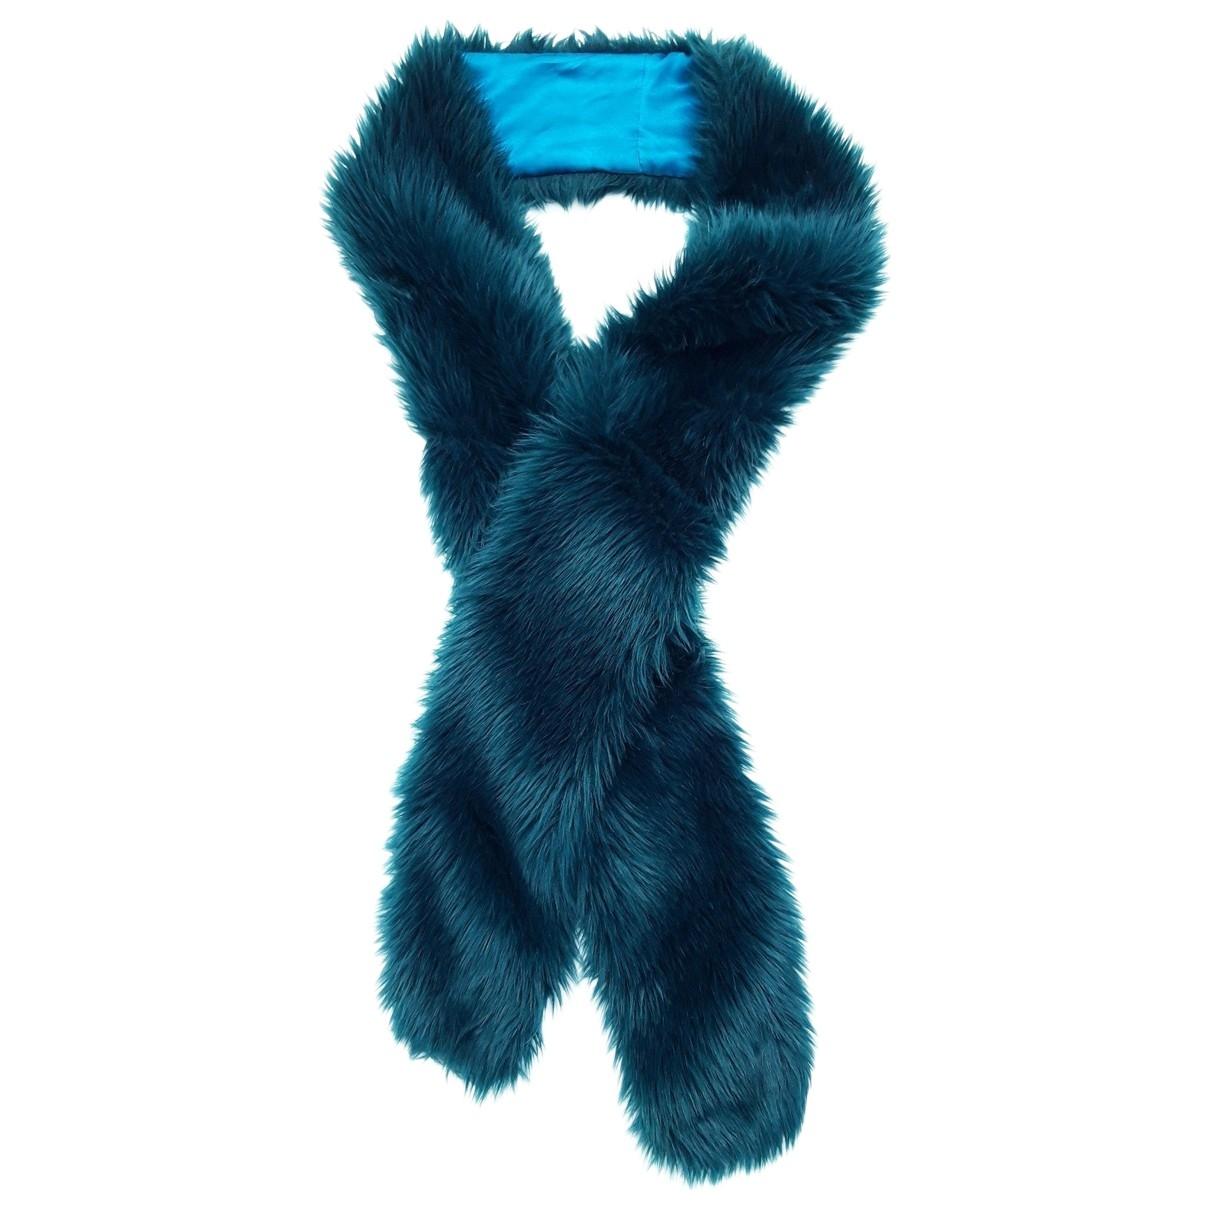 - Foulard Hippie Chic pour femme - turquoise